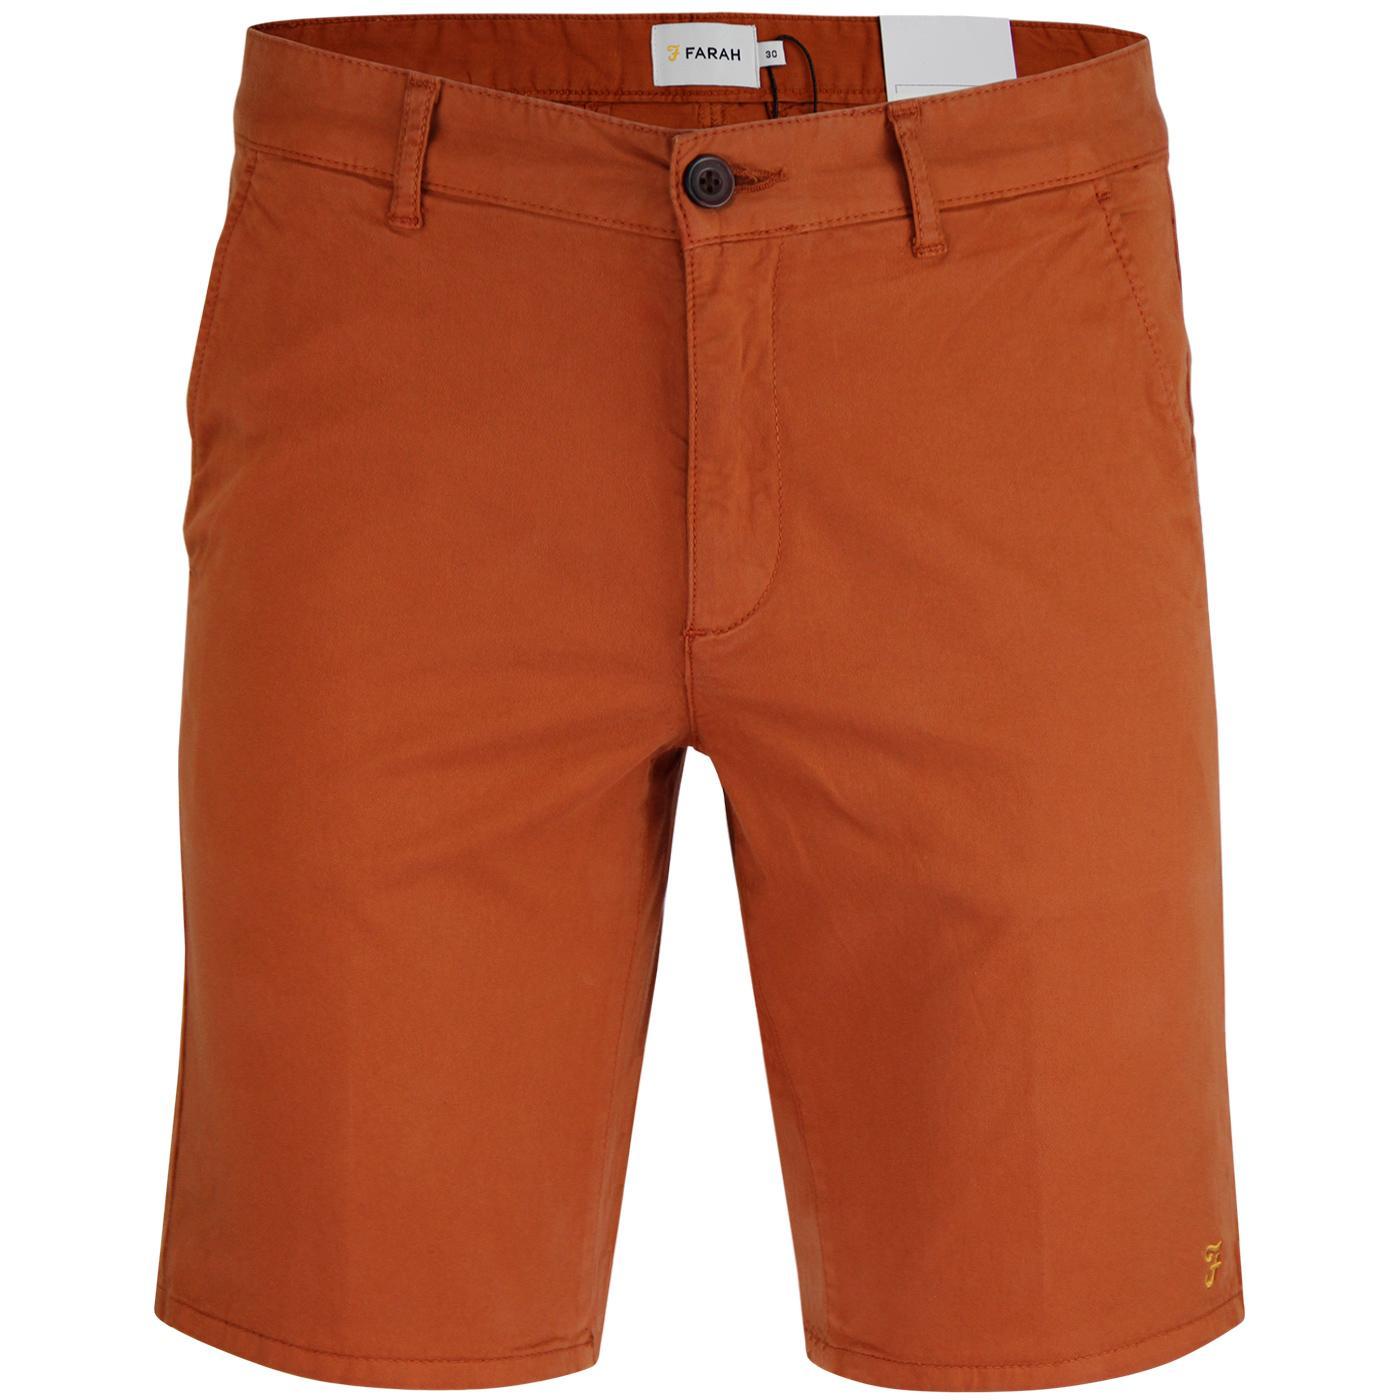 Hawk FARAH Retro Cotton Twill Chino Shorts (Gold)